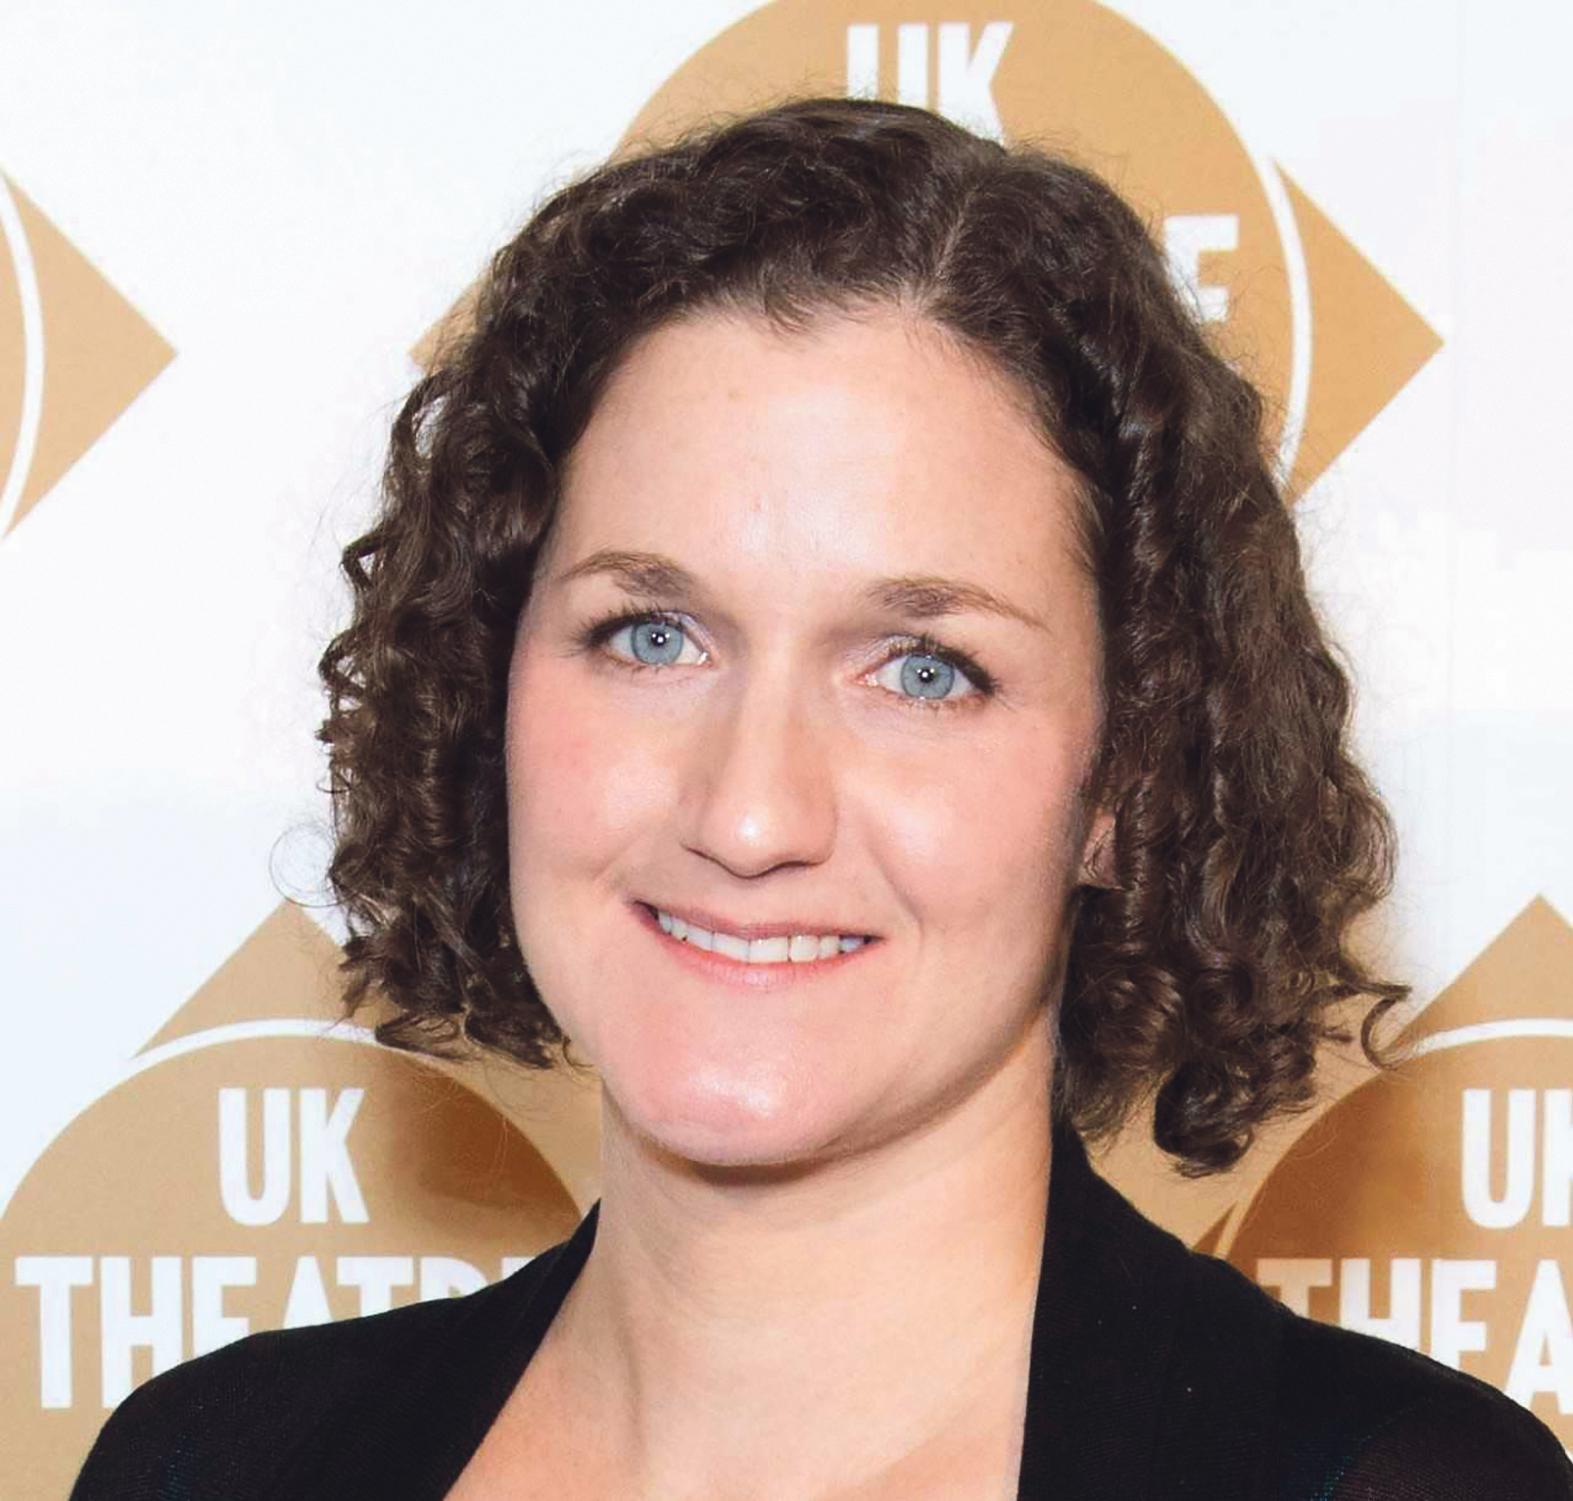 Lizzie Nunnery, who wrote BBC docudrama Daphne: A Fire in Malta